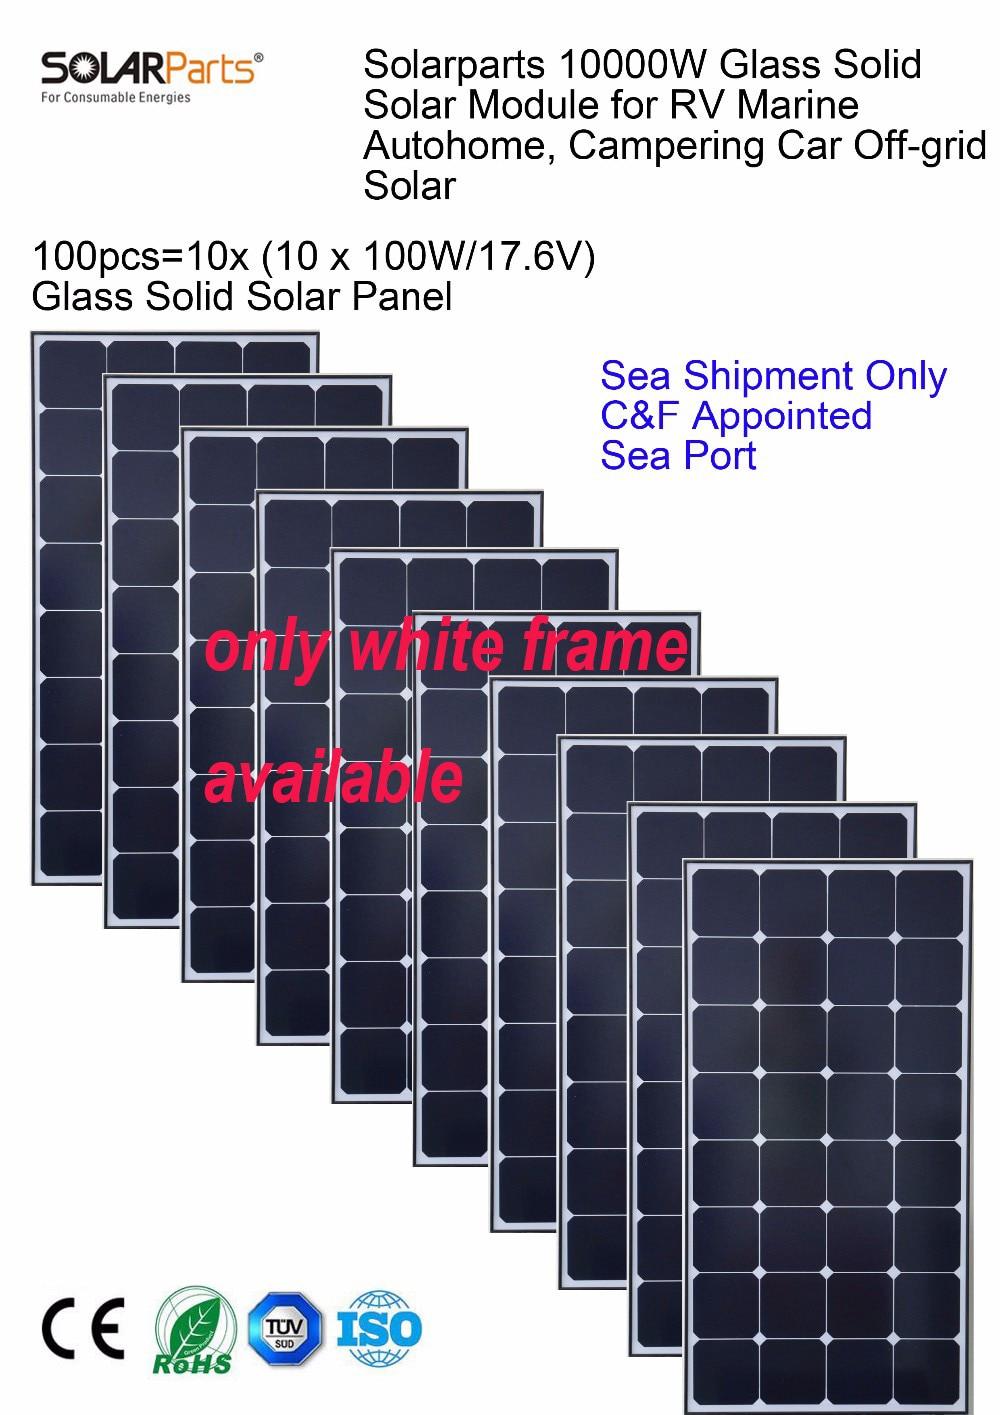 Solarparts 10x 100W monocrystalline solar module high efficiency back contact solar panel cell system 12V DIY kit RV off-grid .